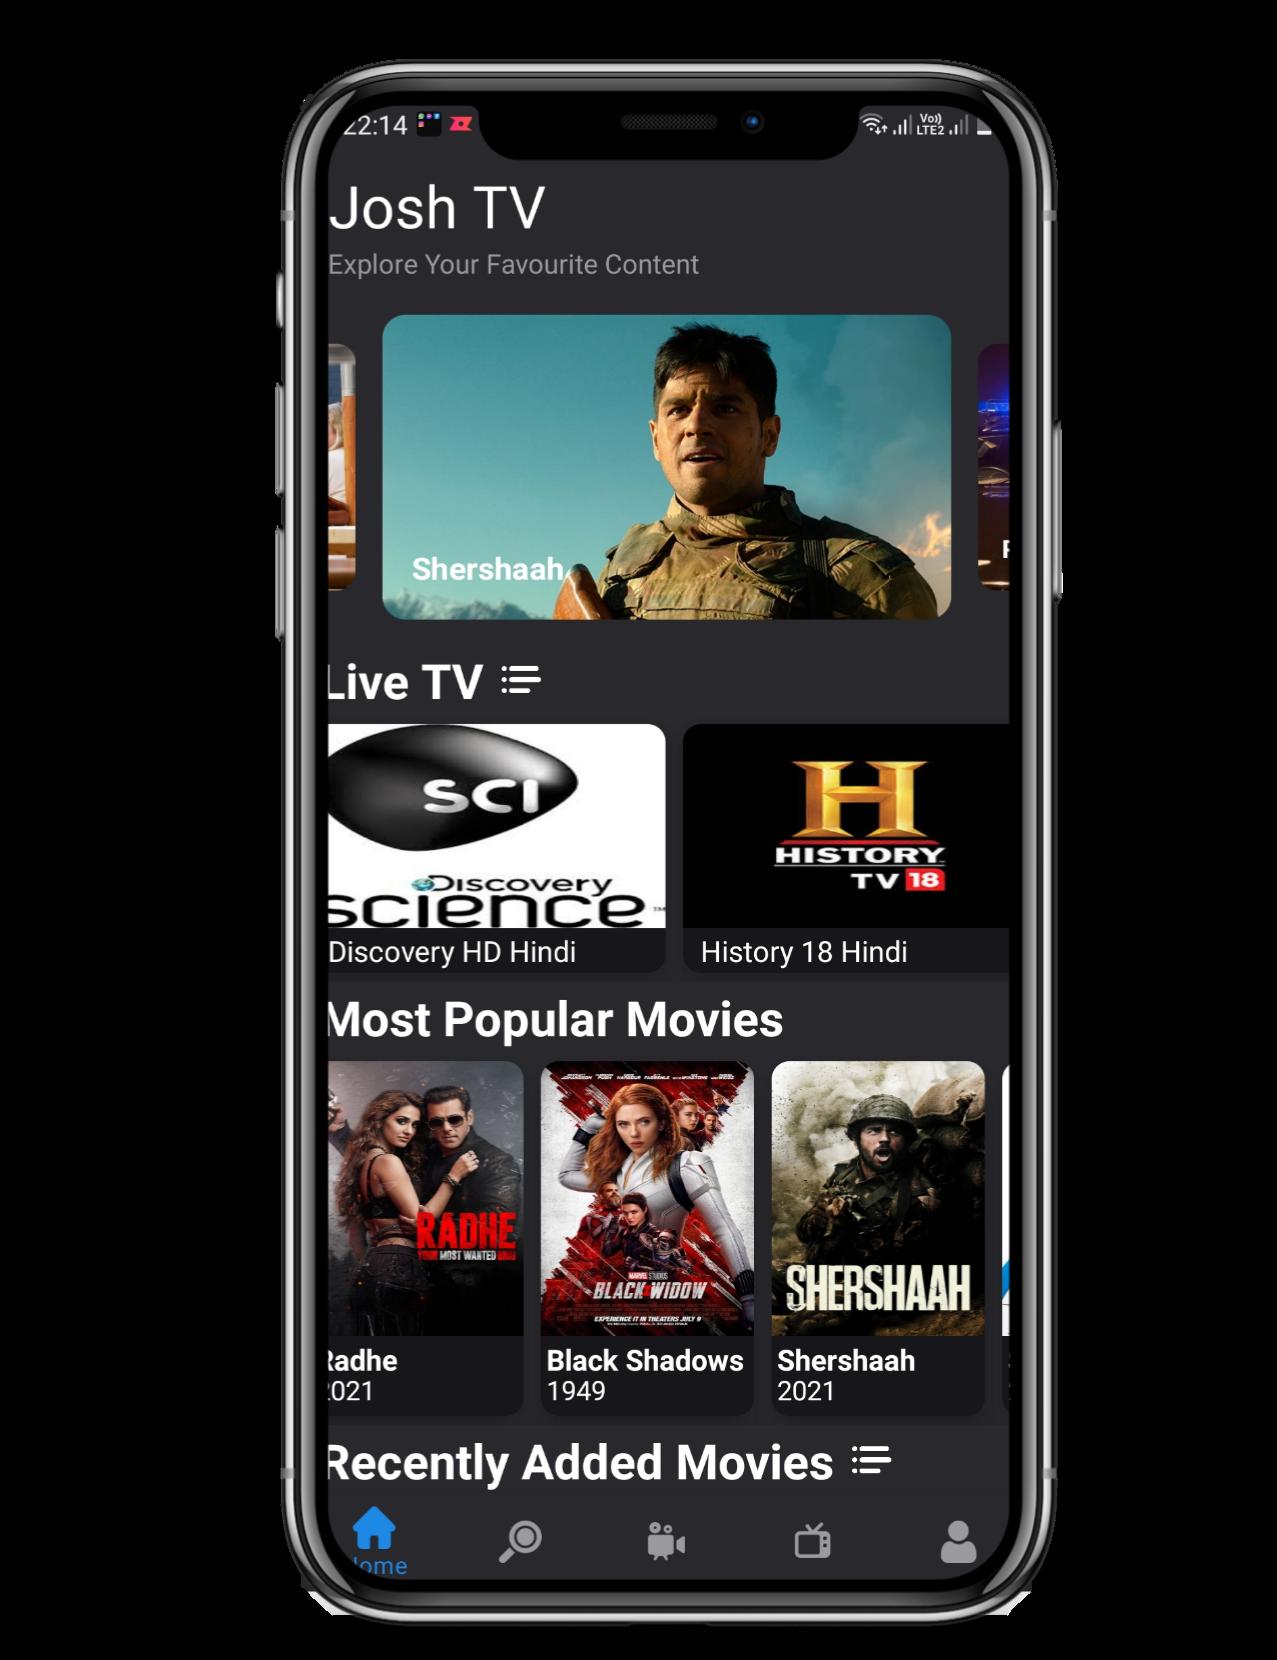 Josh TV App